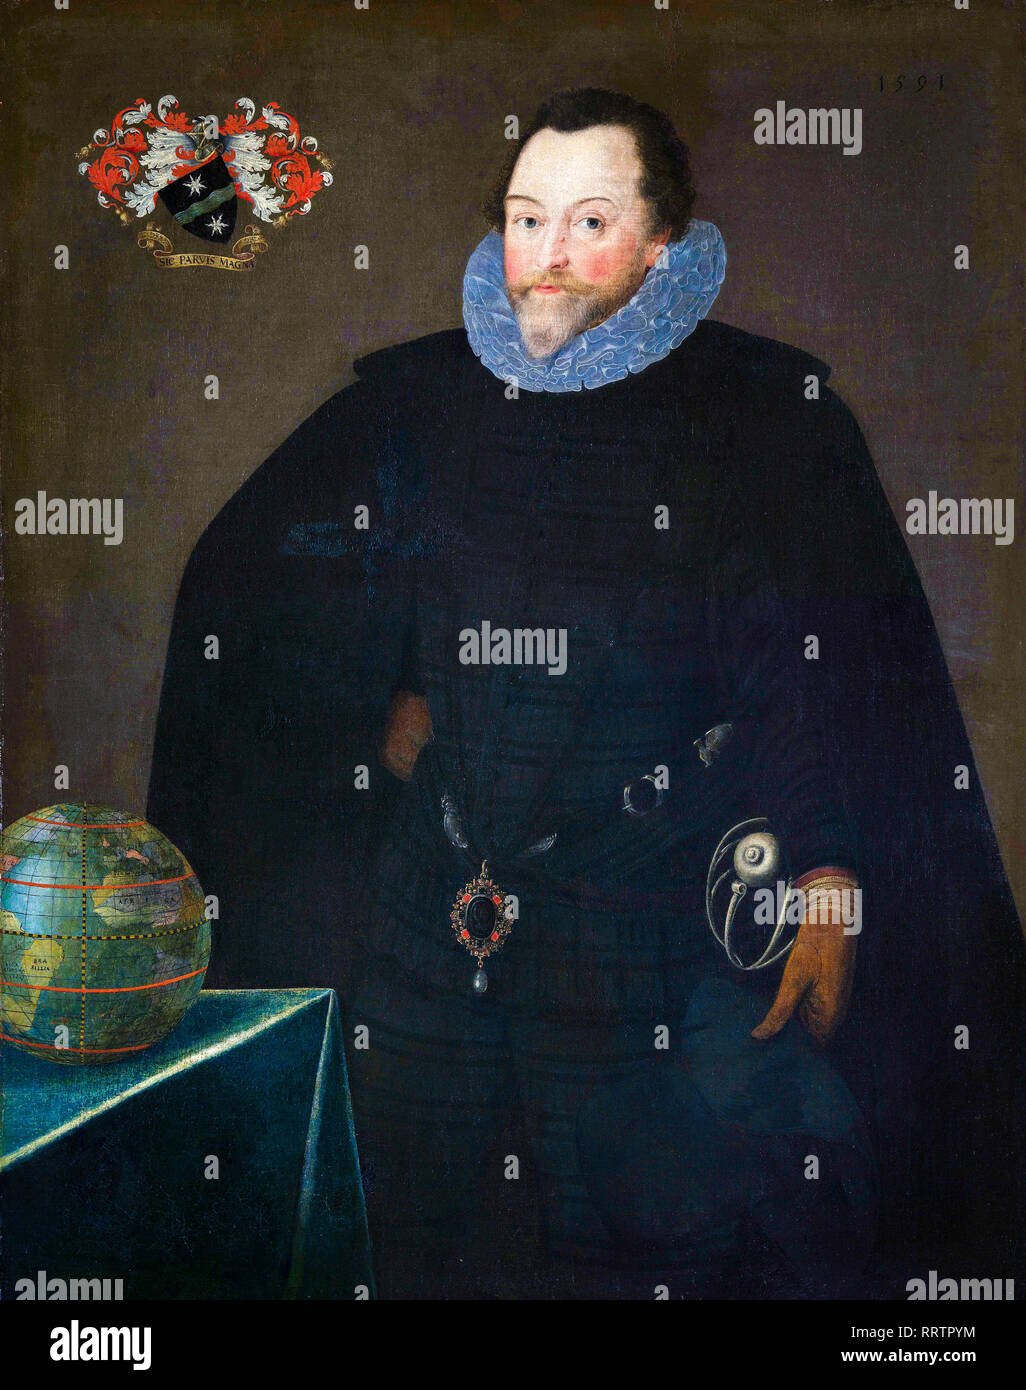 Sir Francis Drake (1540-96), portrait painting, 1591 - Stock Image